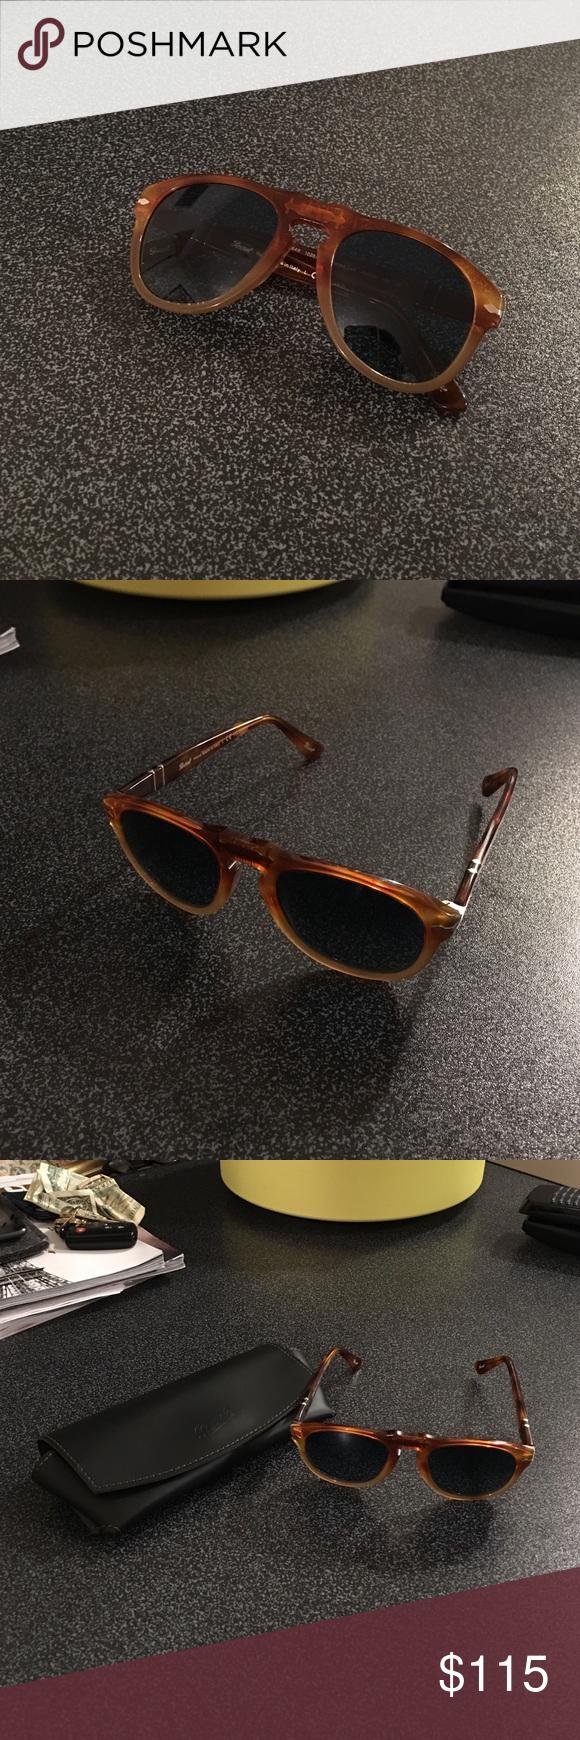 Persol 649 sunglasses size 49/20/135 Unisex Super stylish, tortoise ...